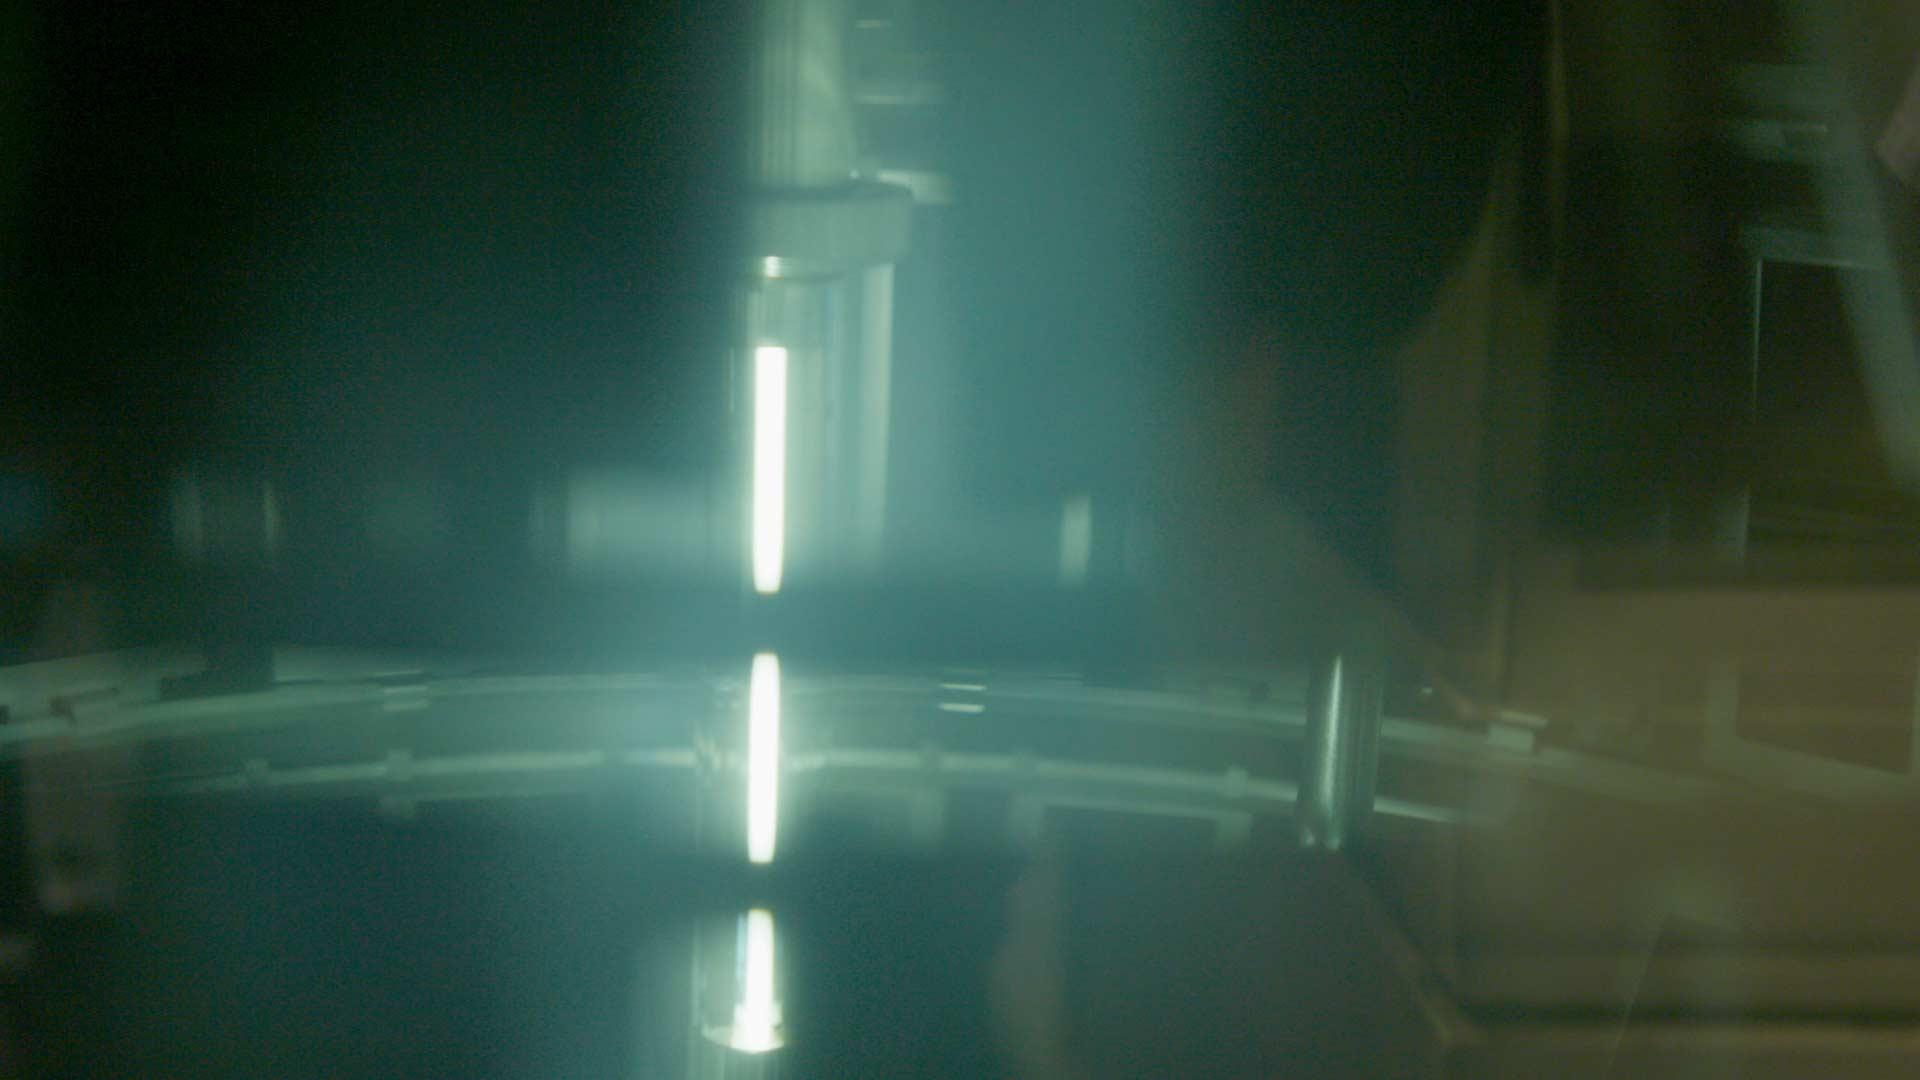 Nissan-Xenon-Weather-Ometer-(XWO)-machine-Sun-Box-4,000-watt-Xenon-bulb